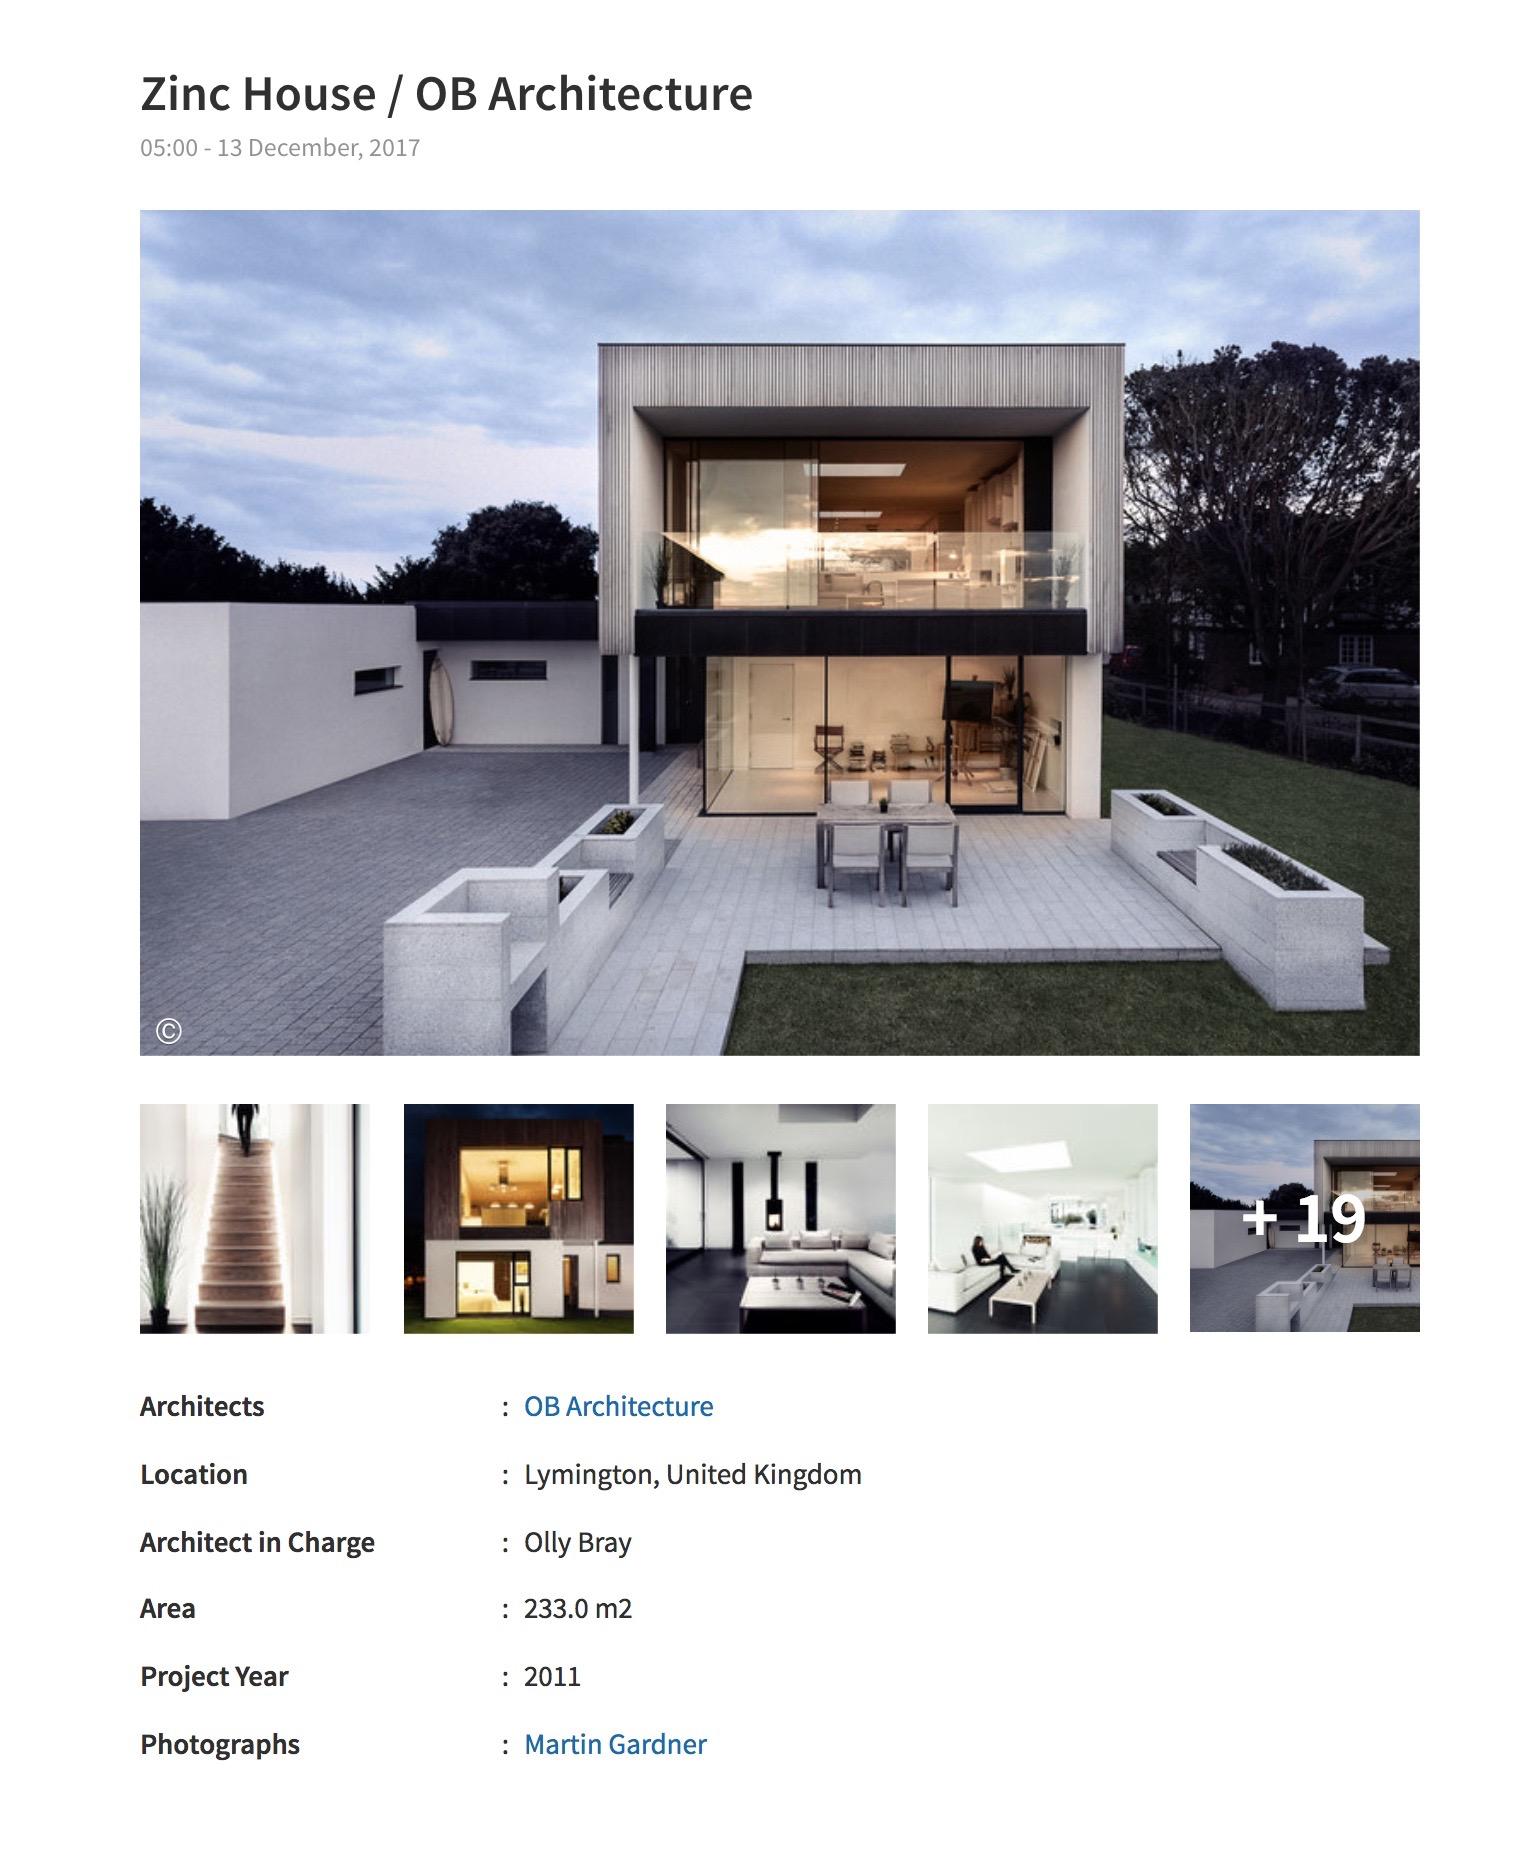 ArchDaily_OB_Zinc_House_131217